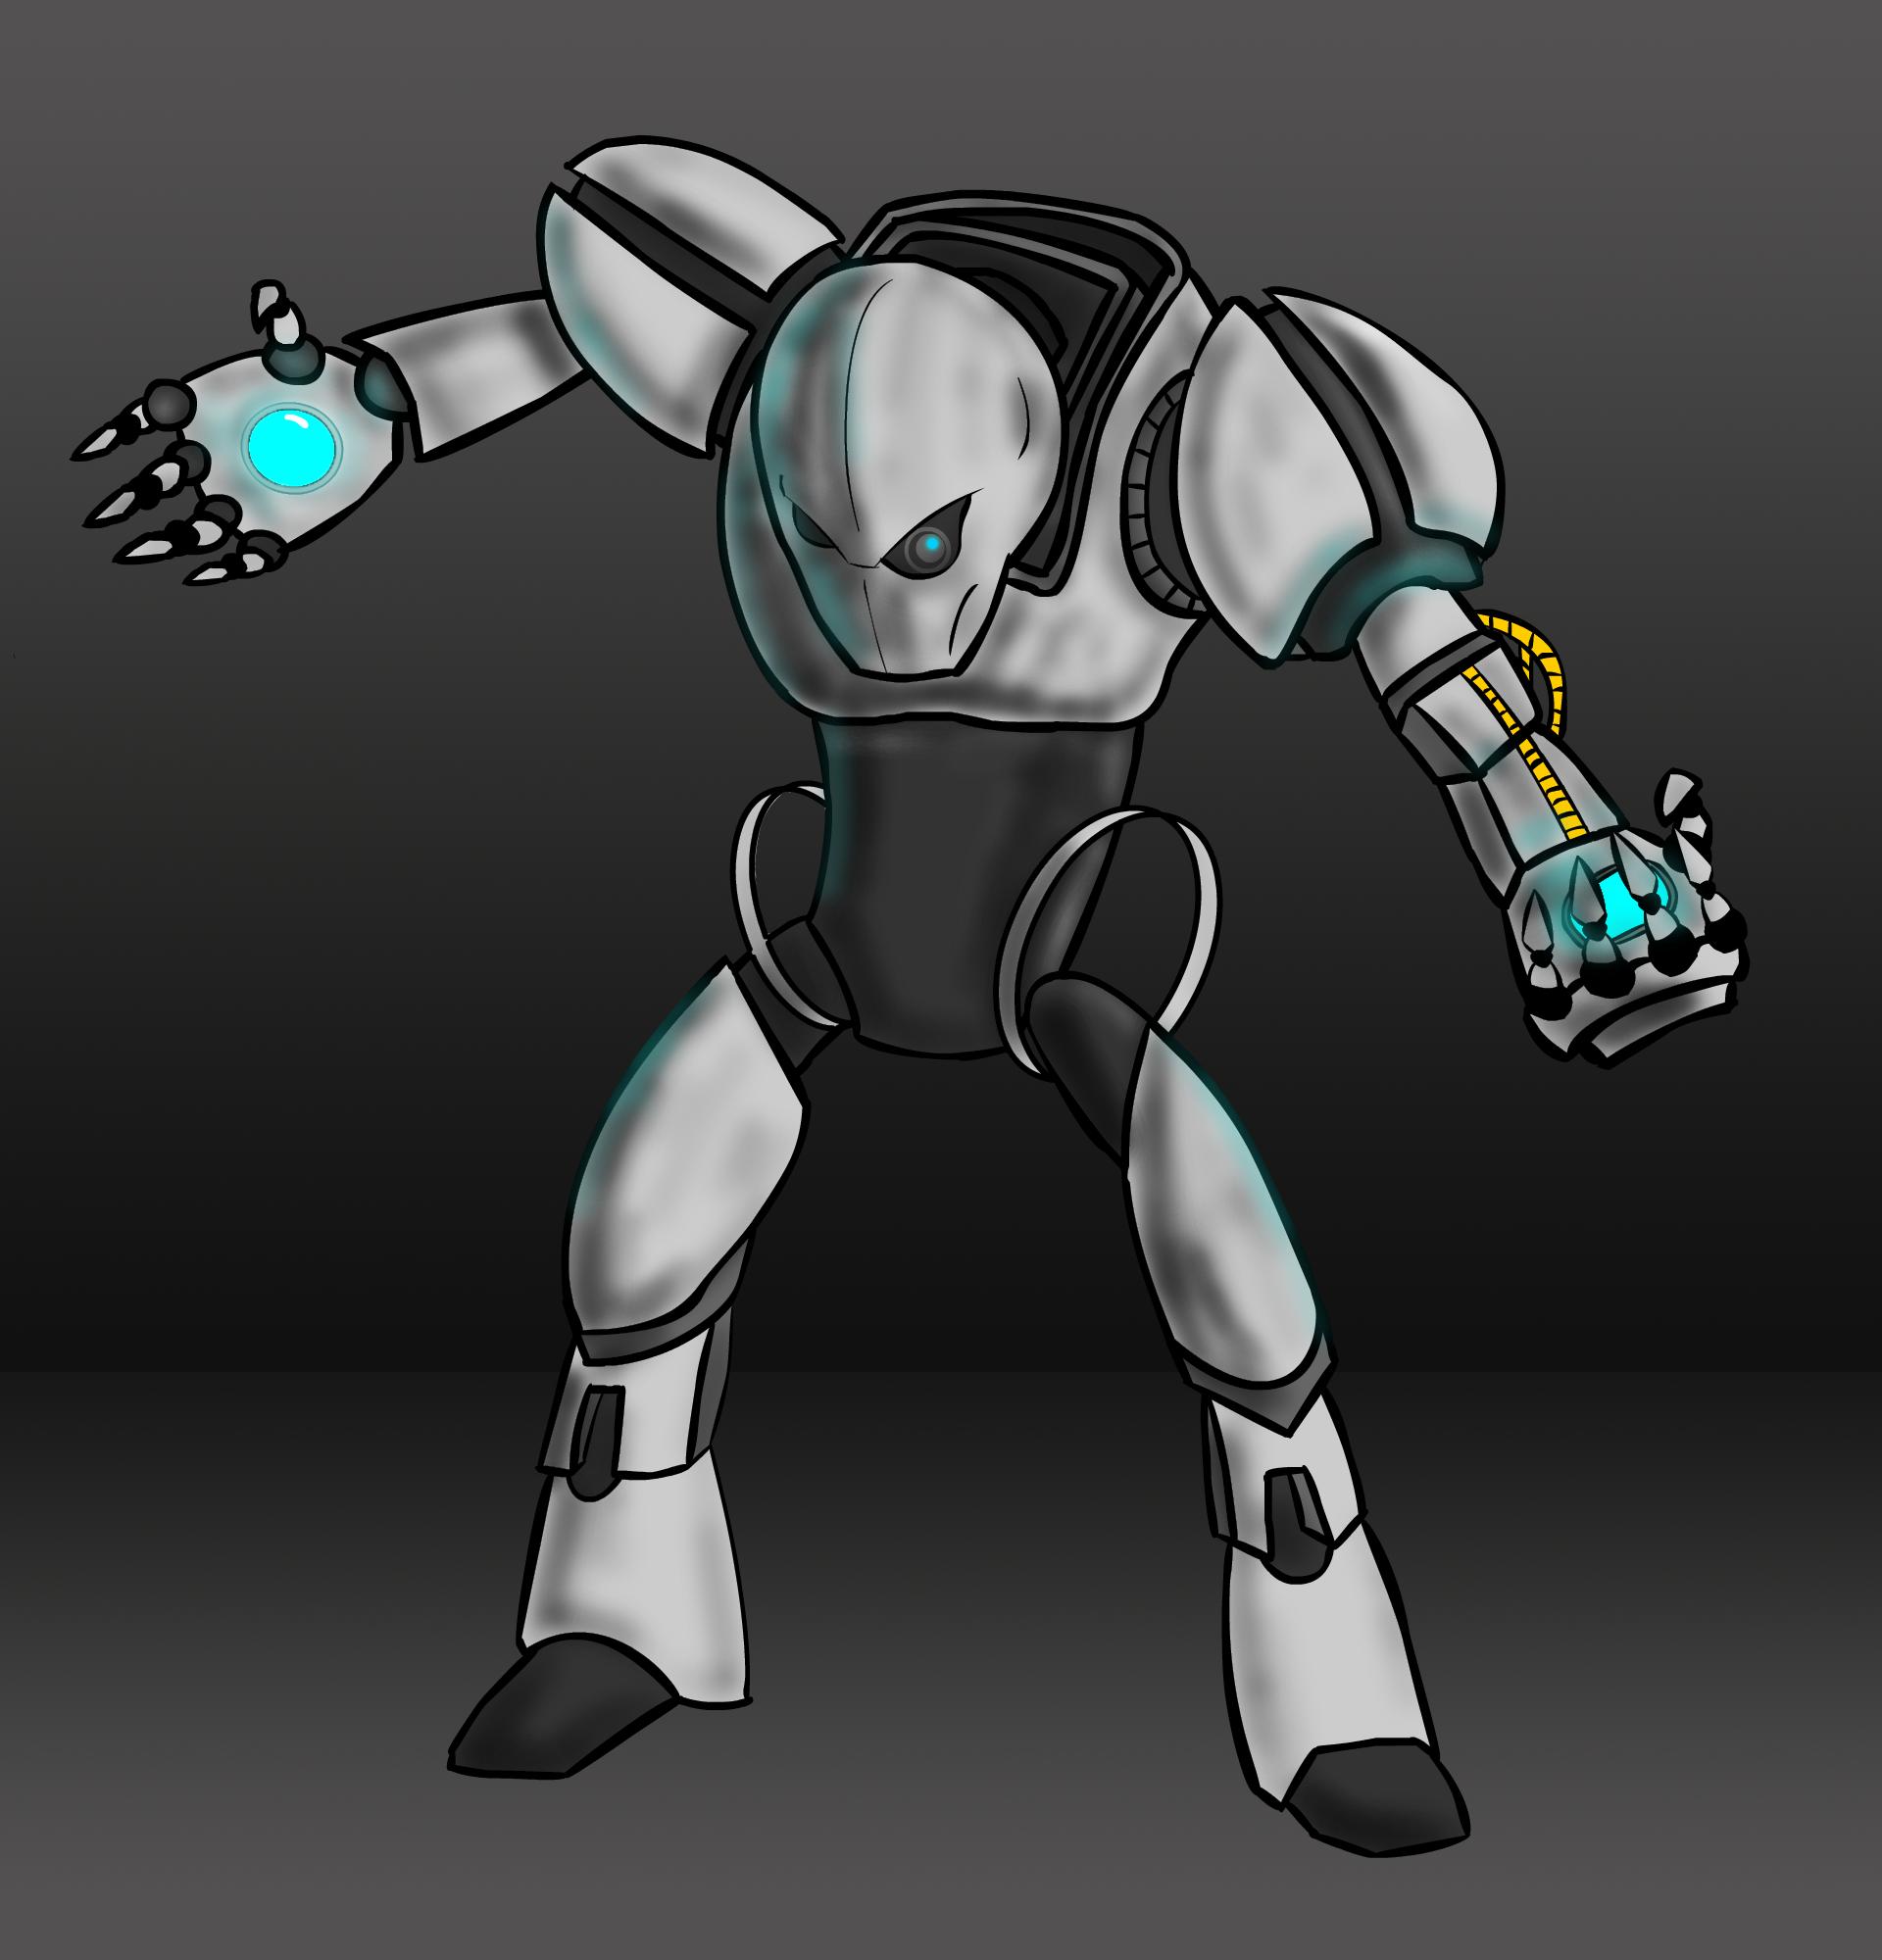 Basic Cyborg Design